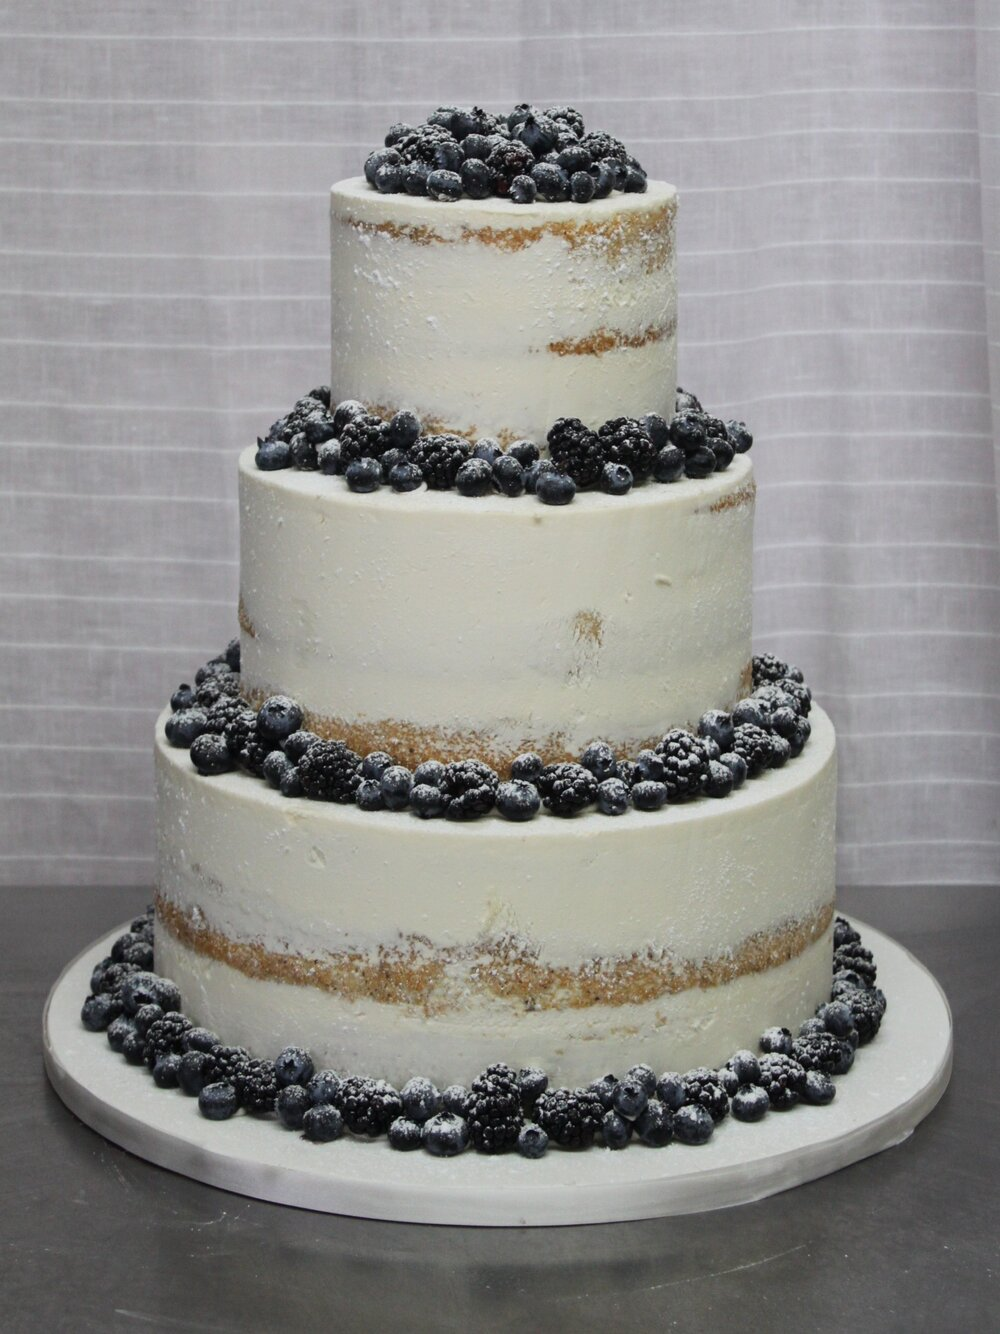 Semi-Naked with Blueberry Cake